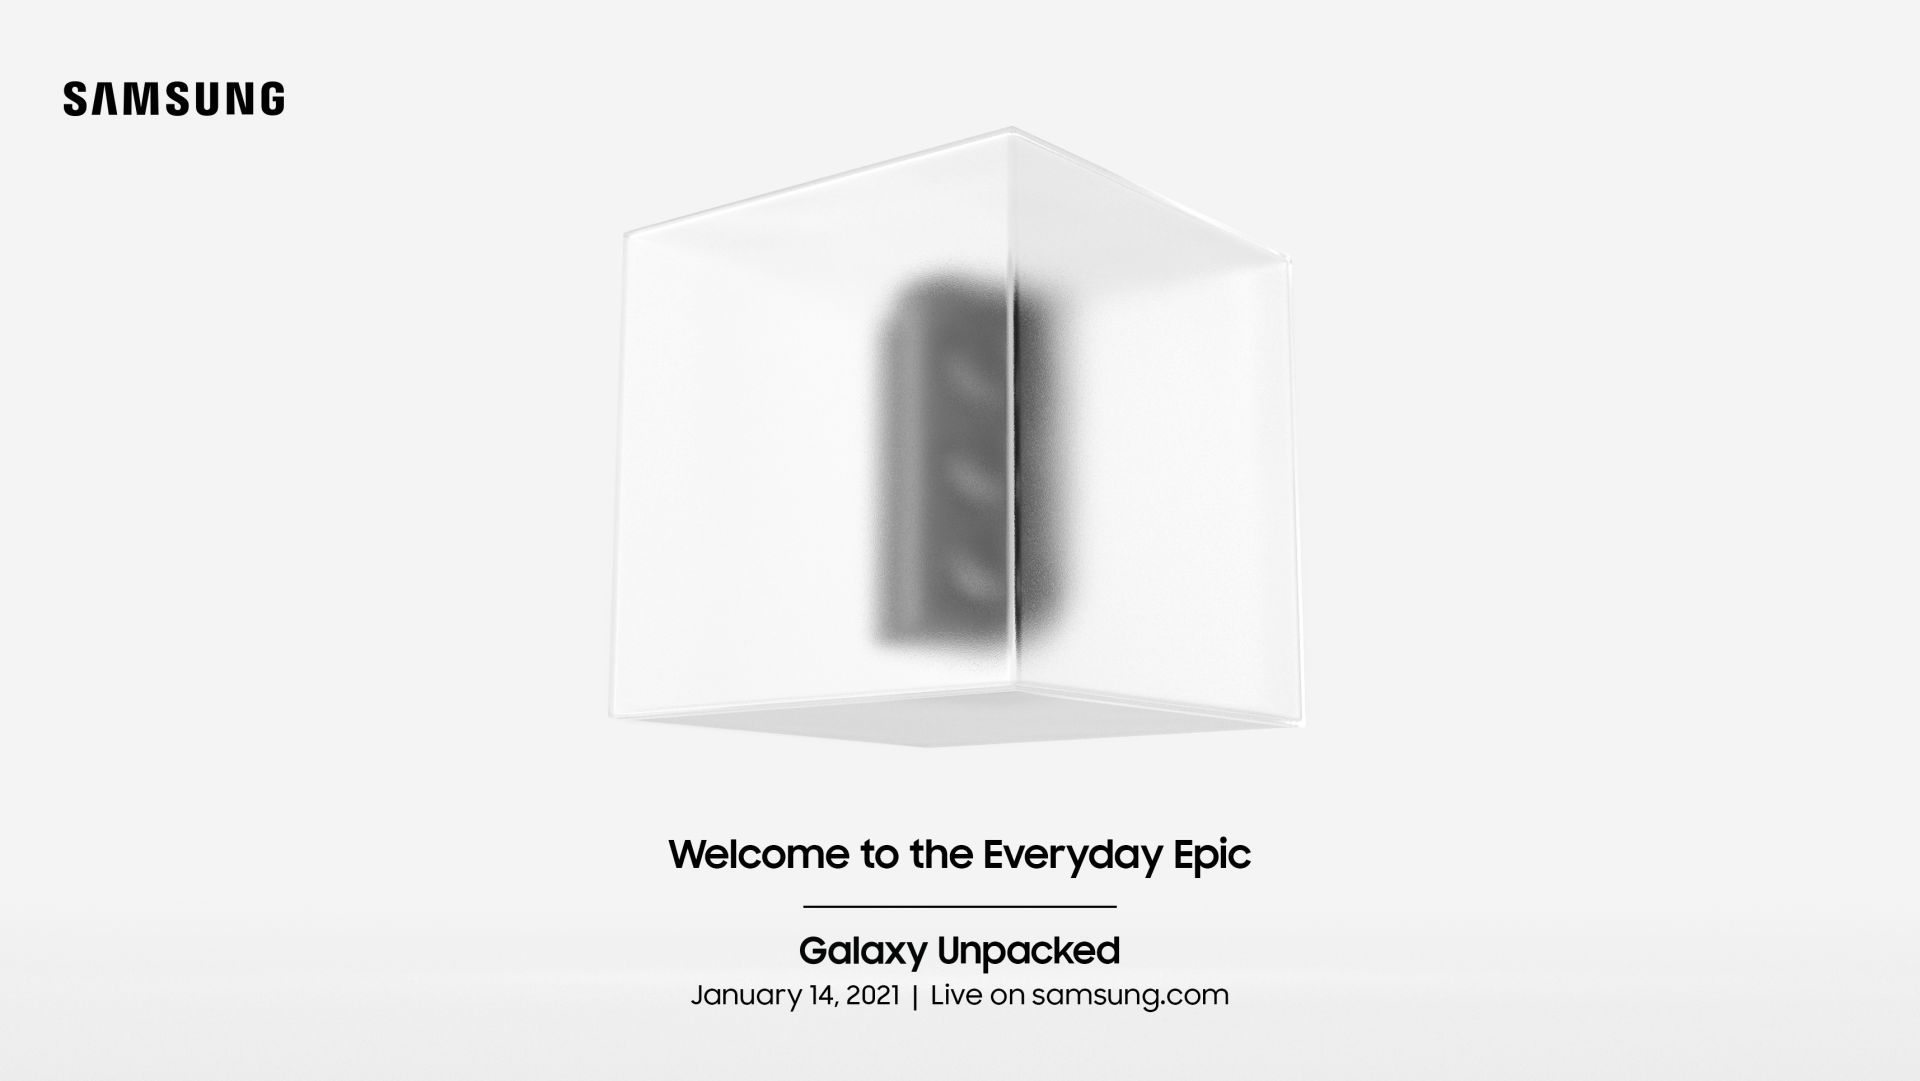 Samsung Galaxy S21 Unpacked evento oficial